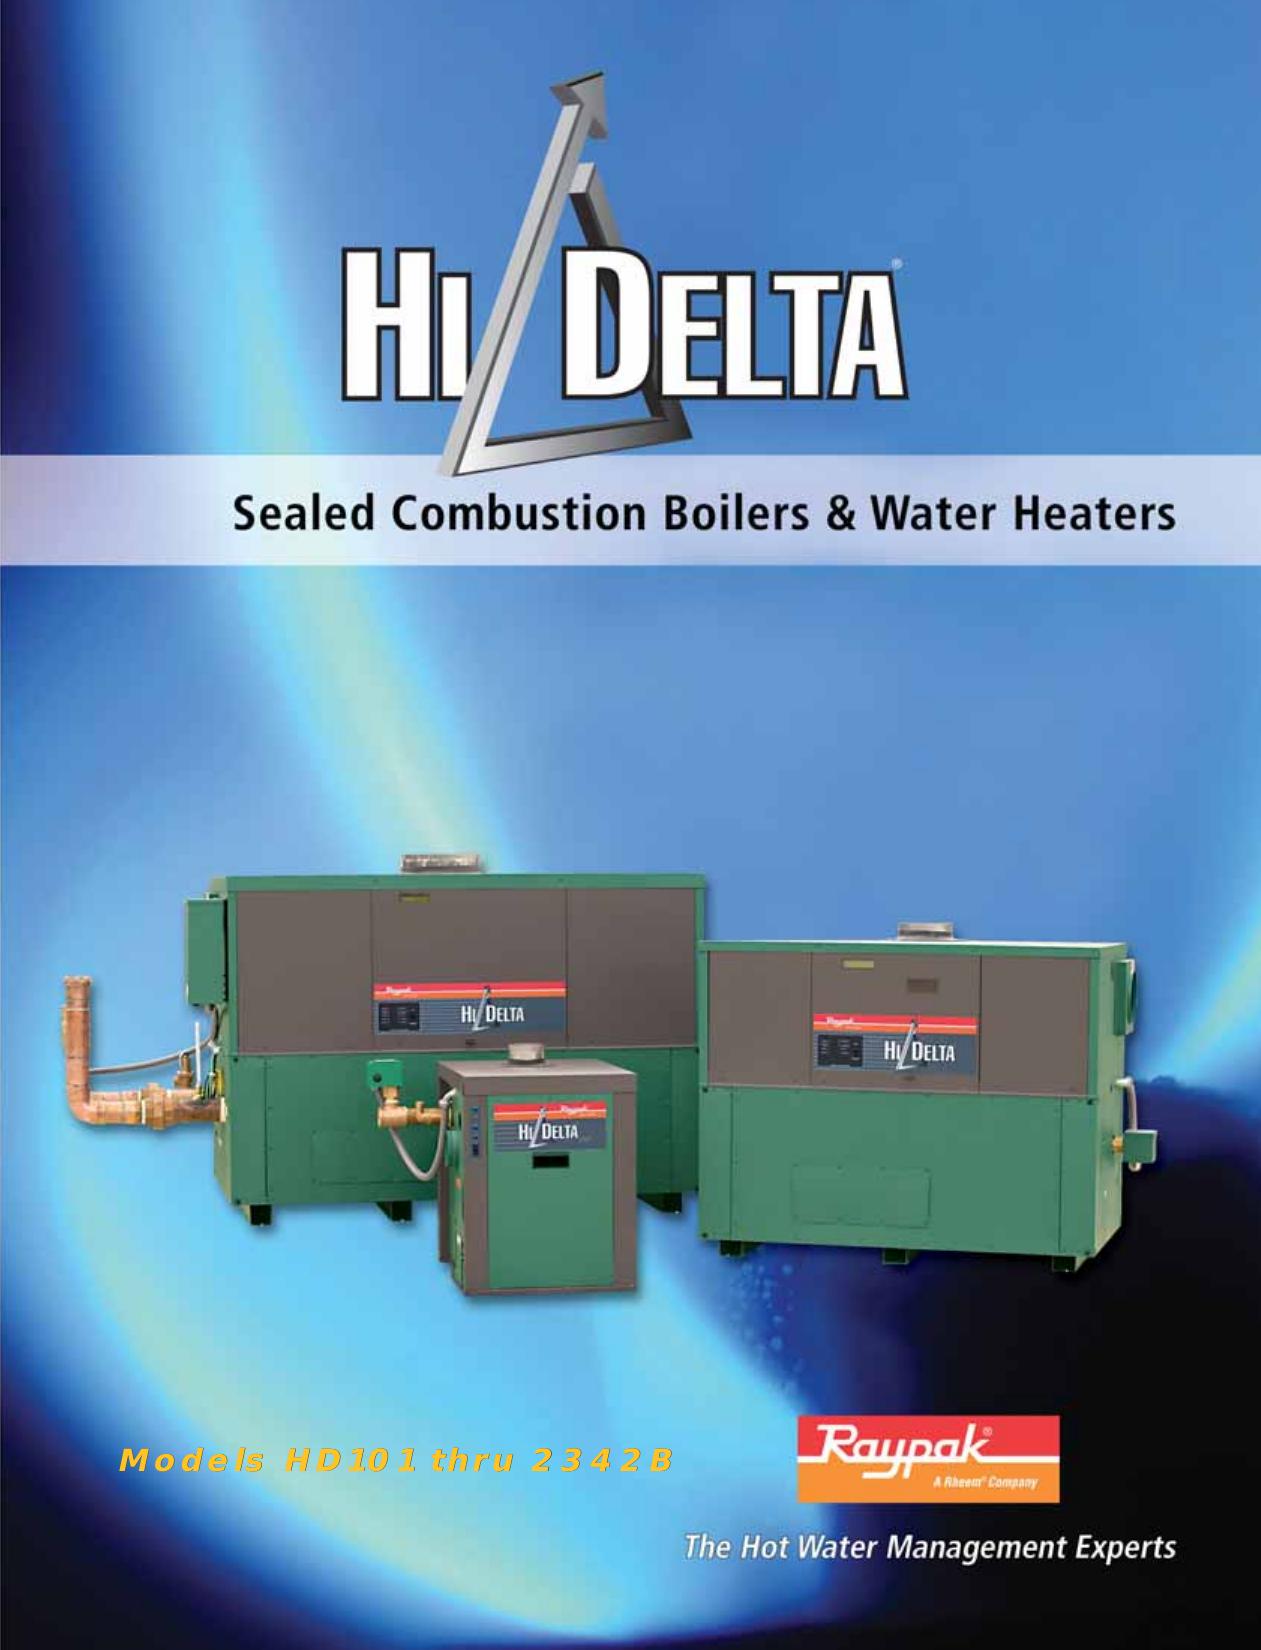 Raypak Hi Delta Hd101 Thru 2342B Users Manual